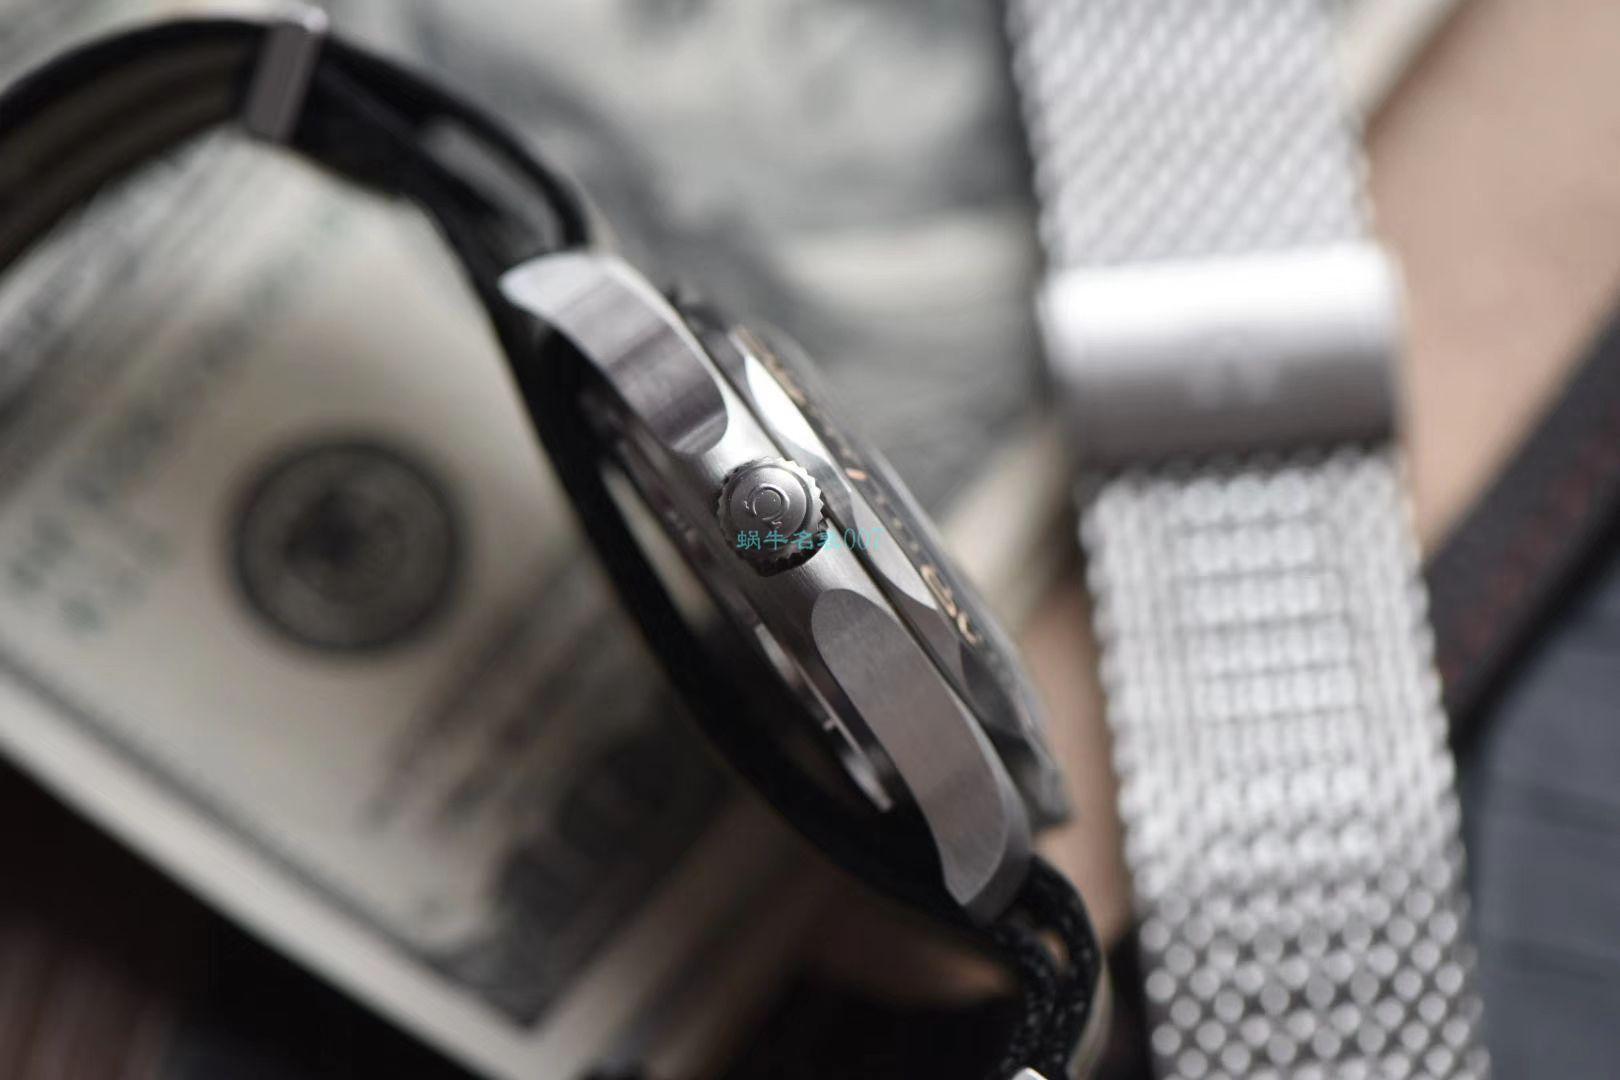 VS厂复刻手表欧米茄邦德007版无暇赴死210.90.42.20.01.001,210.92.42.20.01.001腕表 / M677